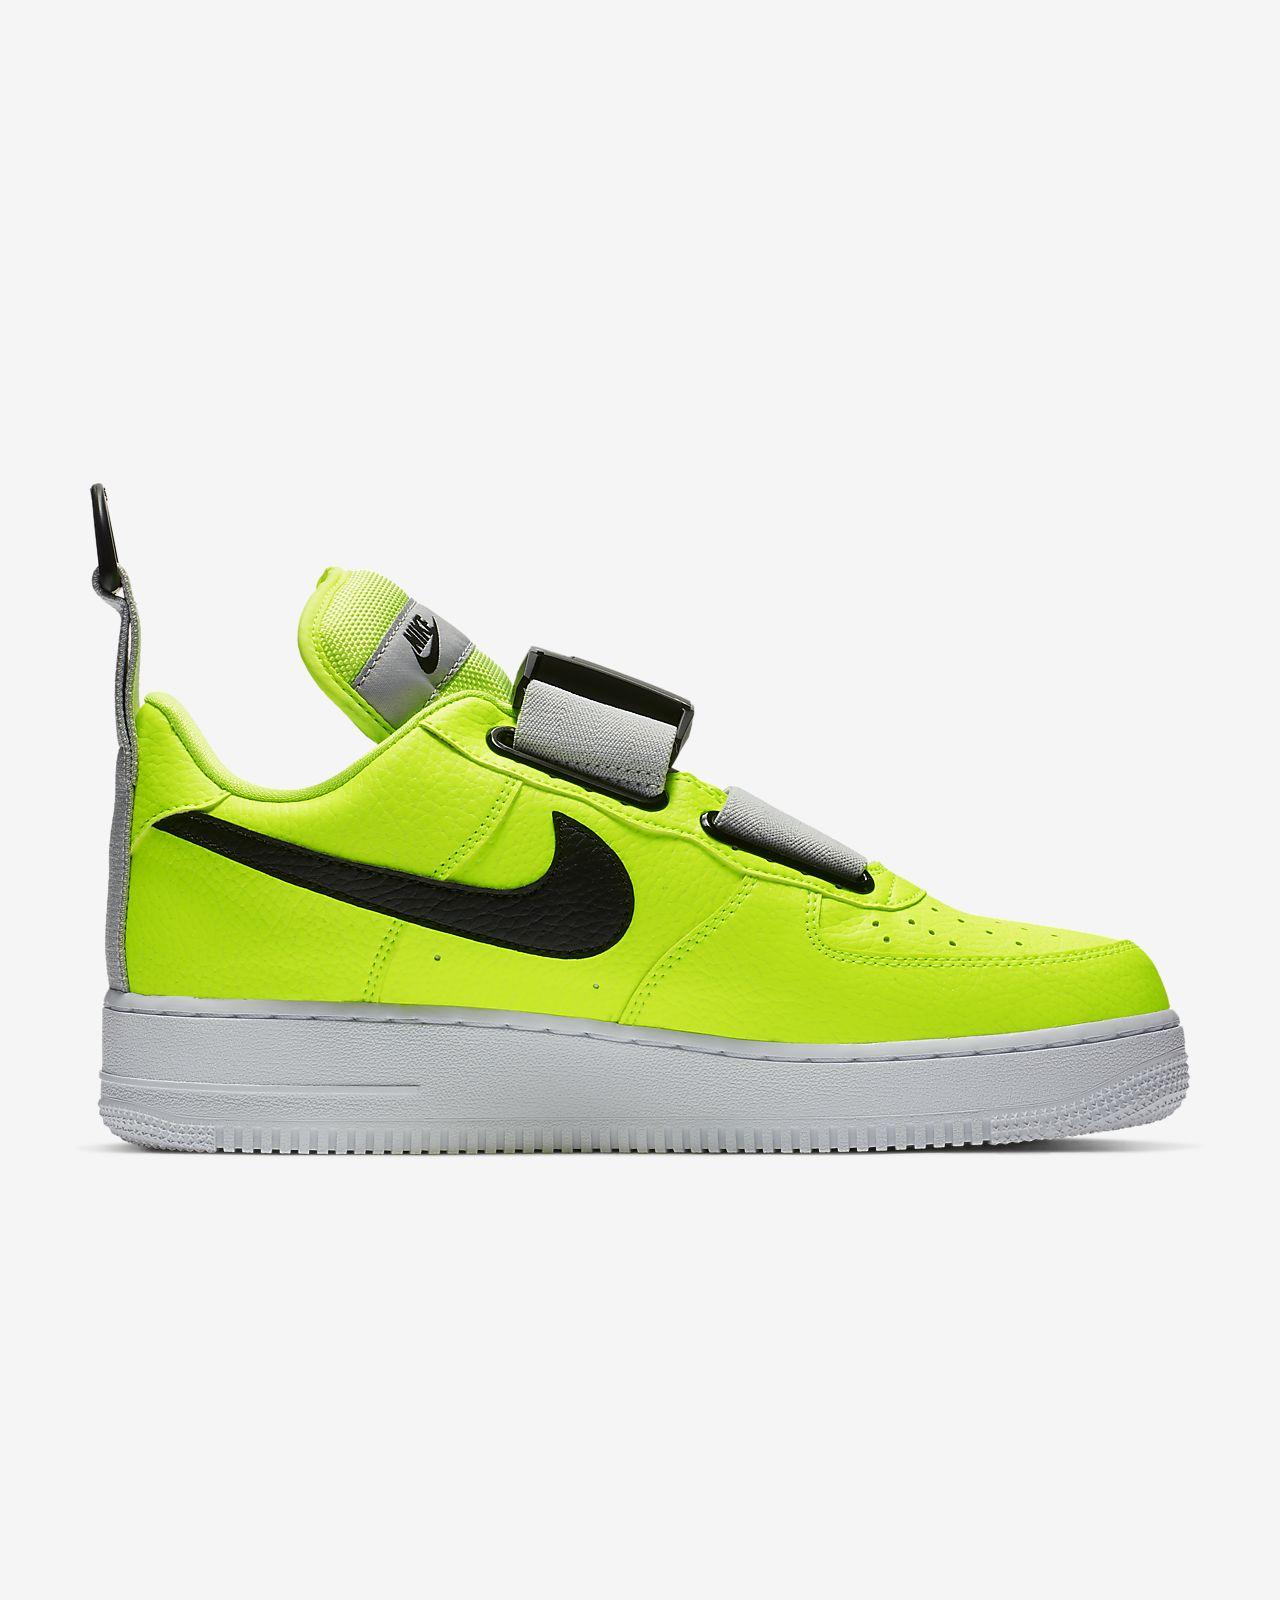 7321ca60 Мужские кроссовки Nike Air Force 1 Utility. Nike.com RU